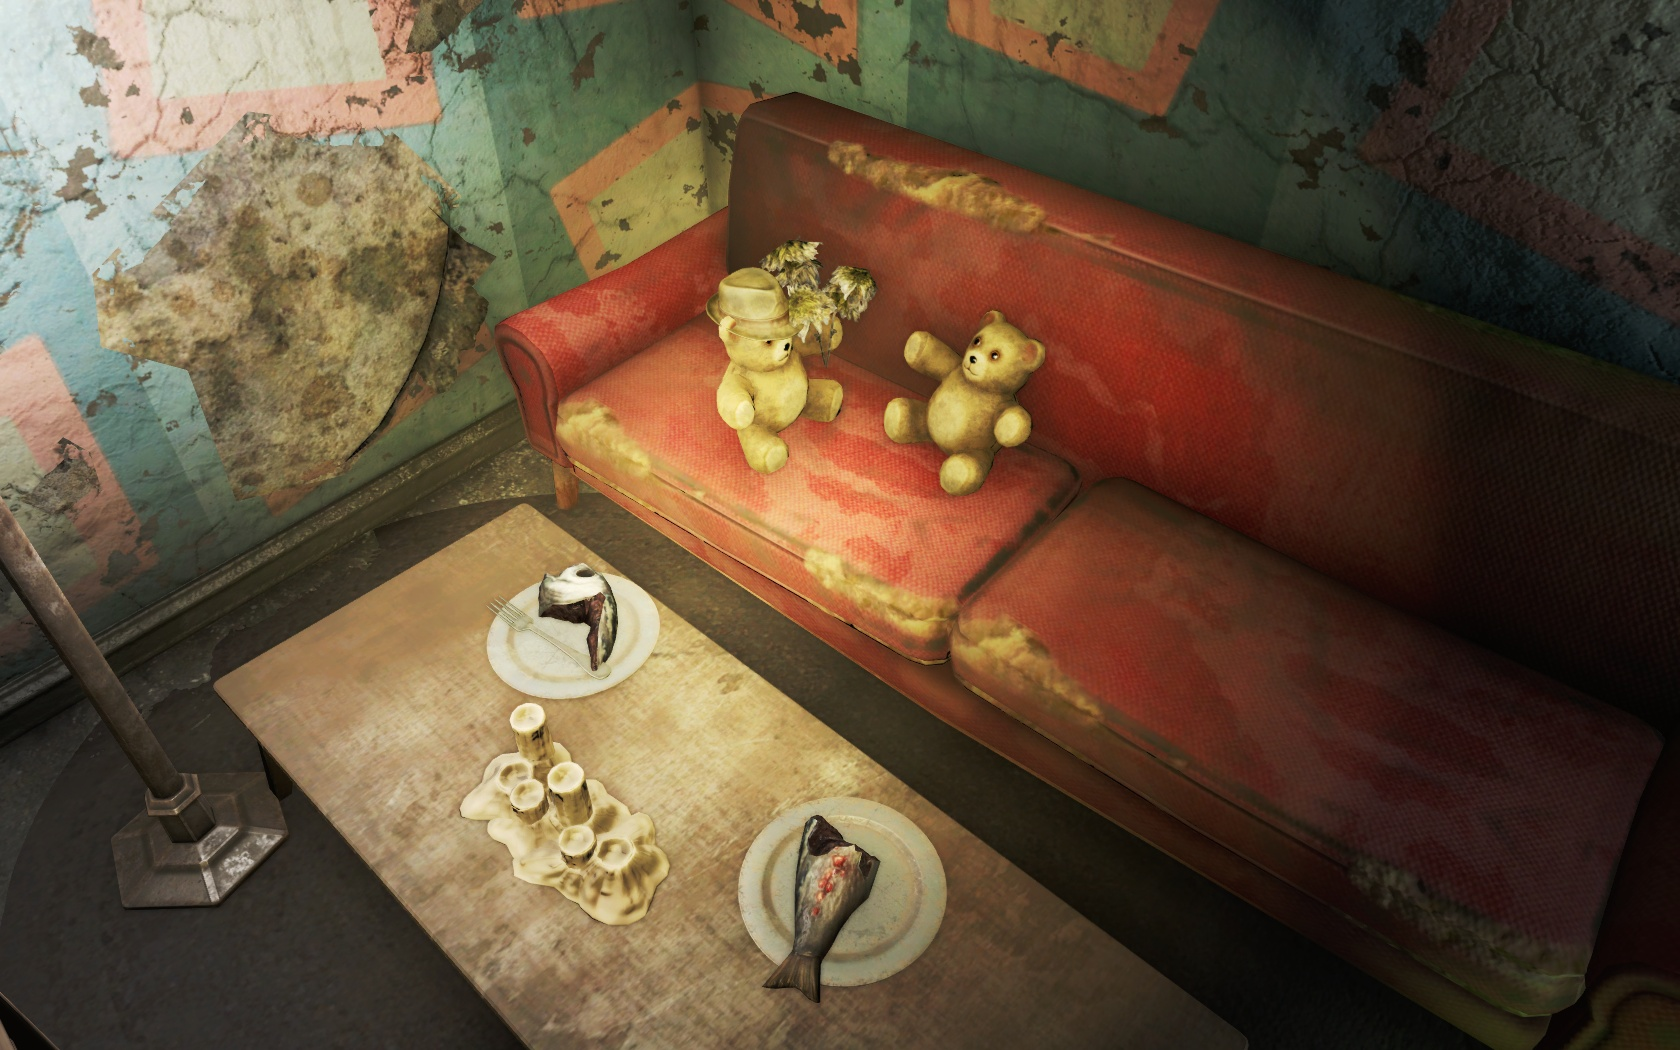 Свидание (Ядер-Мир, Павильон смеха) - Fallout 4 Nuka World, Павильон смеха, Ядер-Мир